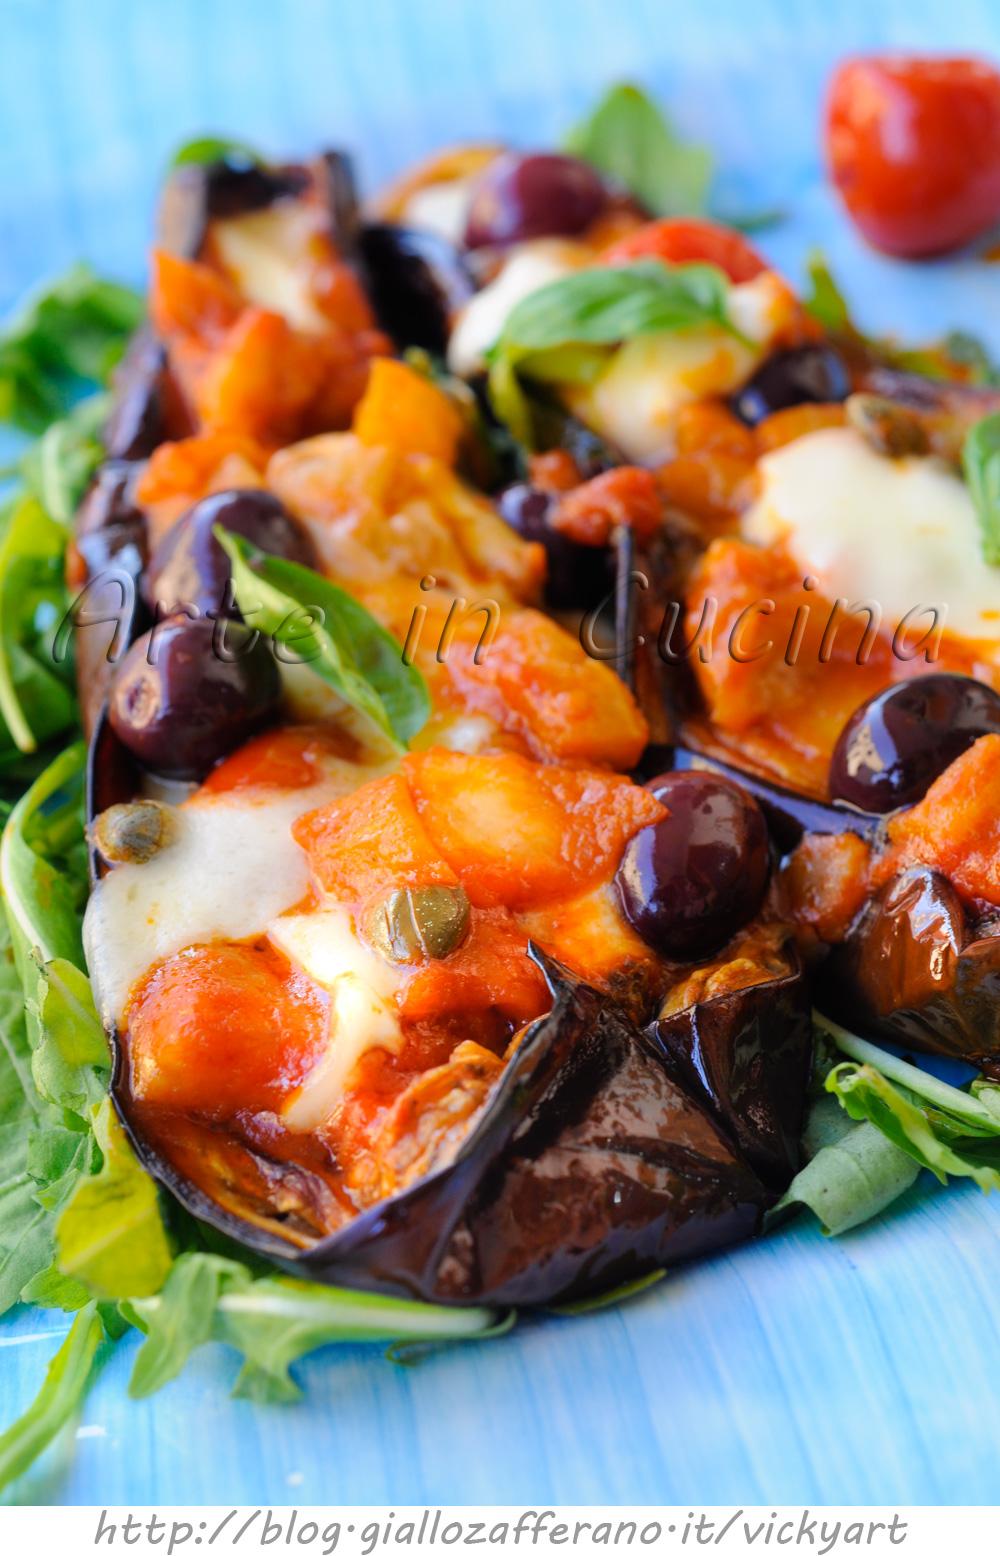 Melanzane a scarpone ricetta napoletana vickyart arte in cucina